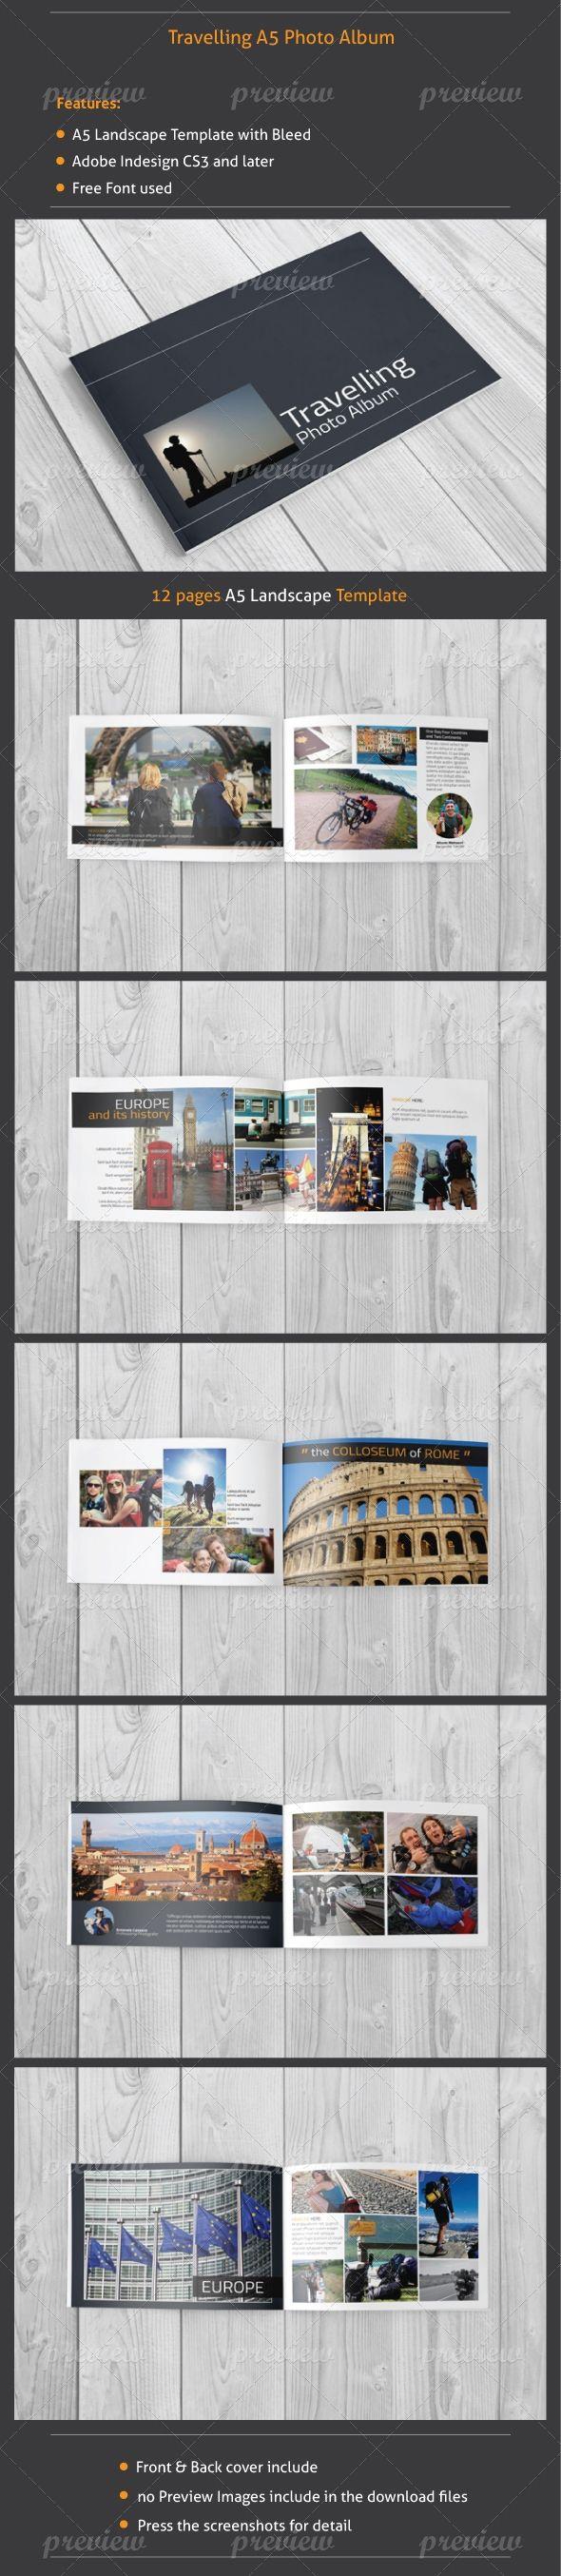 Traveling+Photo+Album+-+http://www.codegrape.com/item/traveling-photo-album/3389